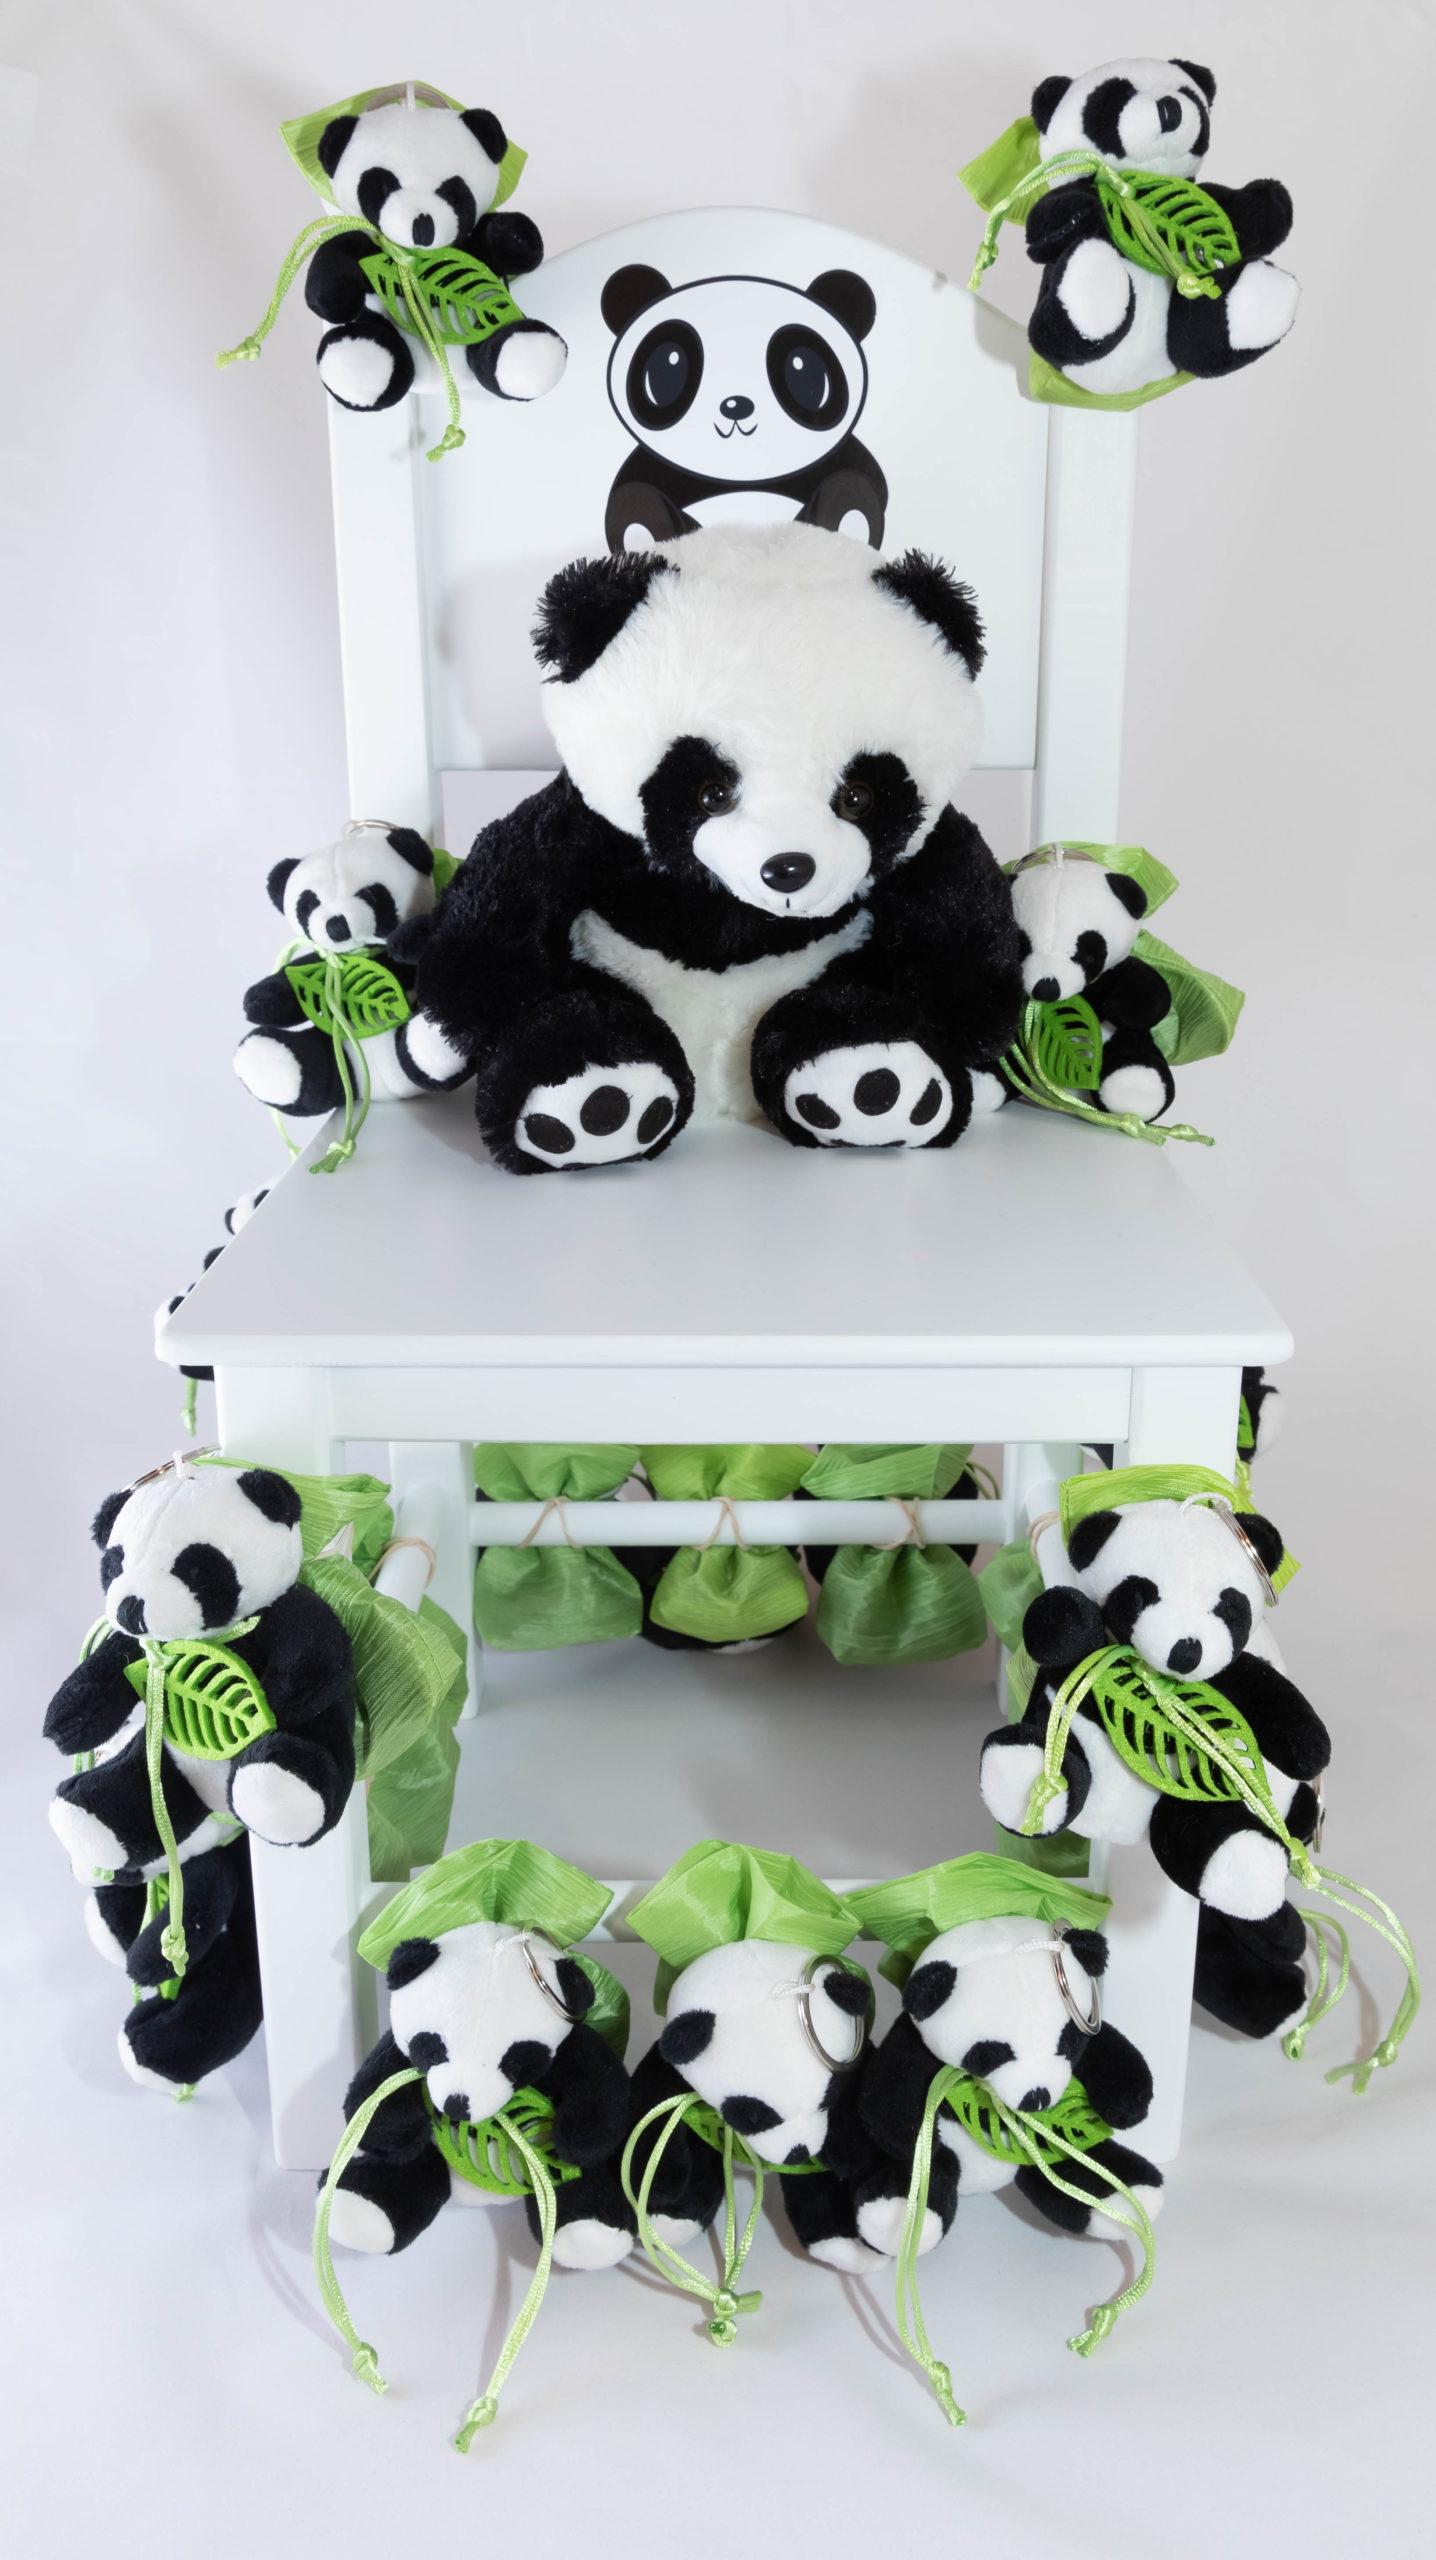 Chaise + sujet - Panda Image